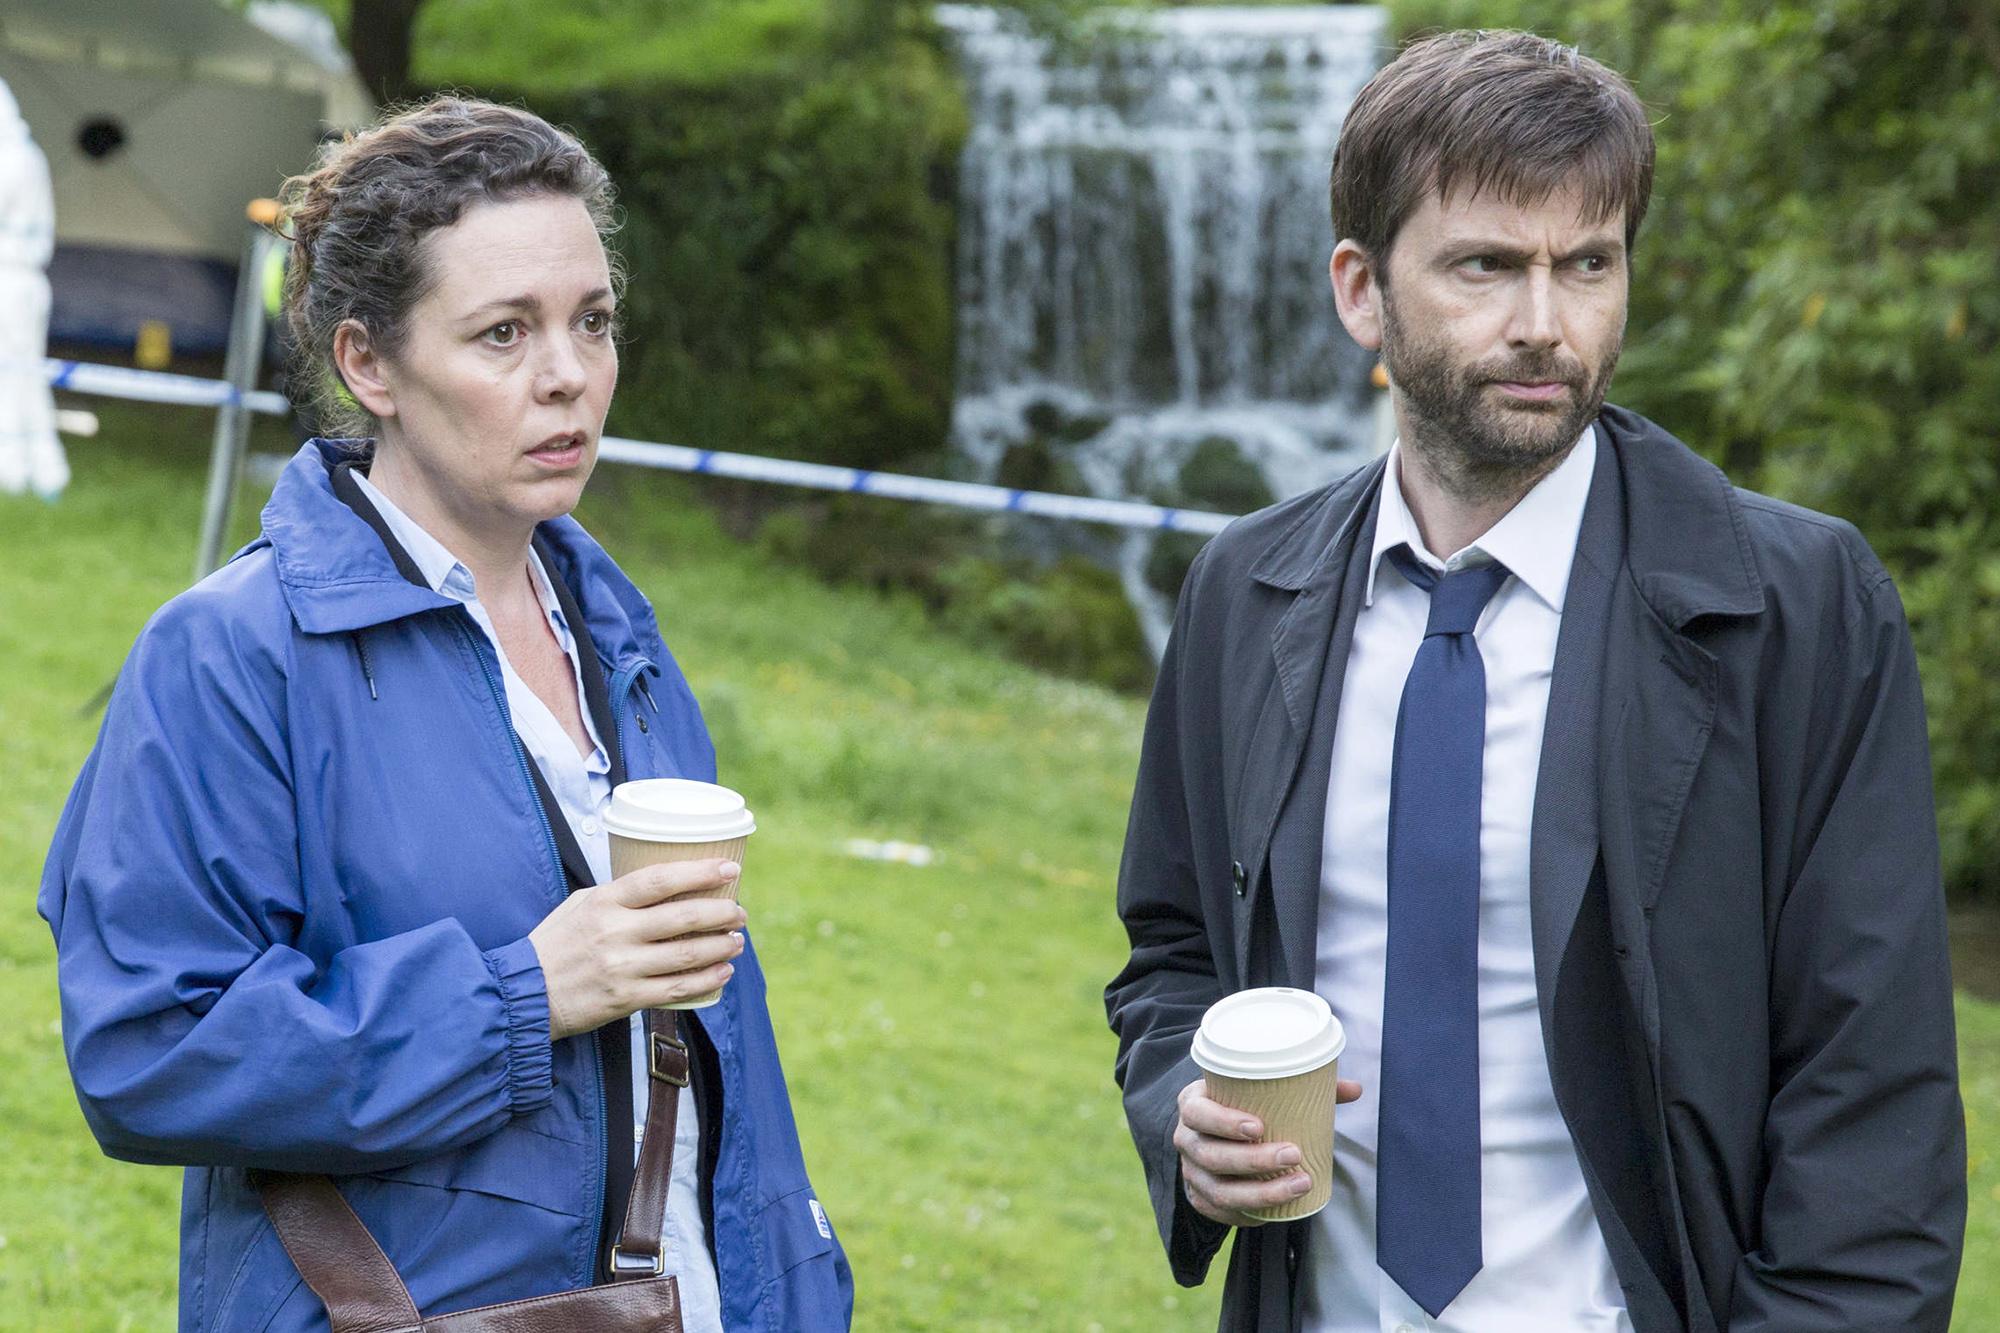 Sexual predator haunts final season of 'Broadchurch'